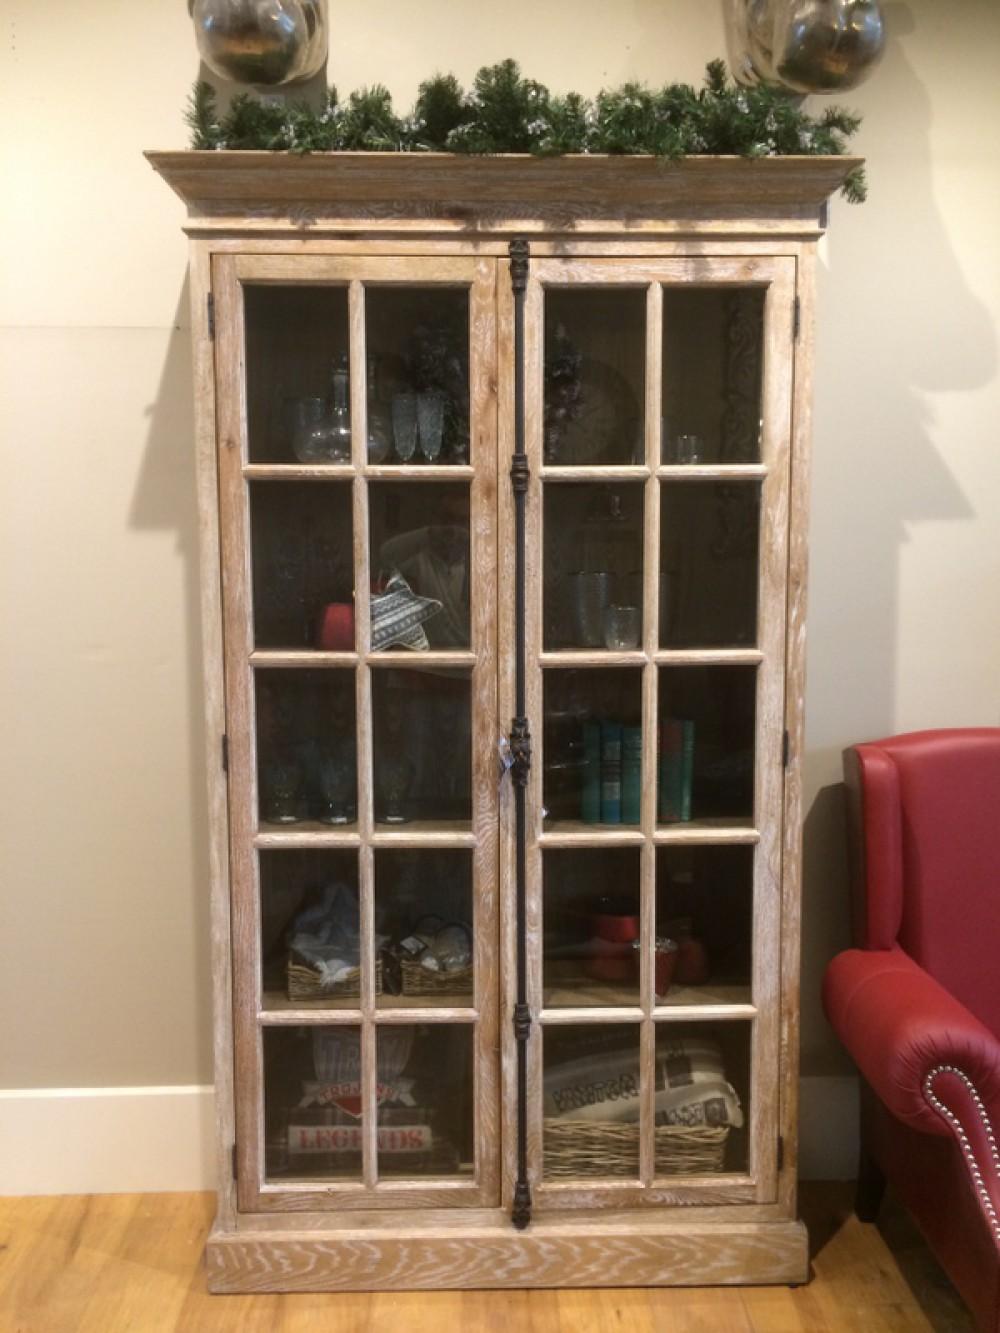 vitrine vintage style vitrinenschrank im landhausstil. Black Bedroom Furniture Sets. Home Design Ideas